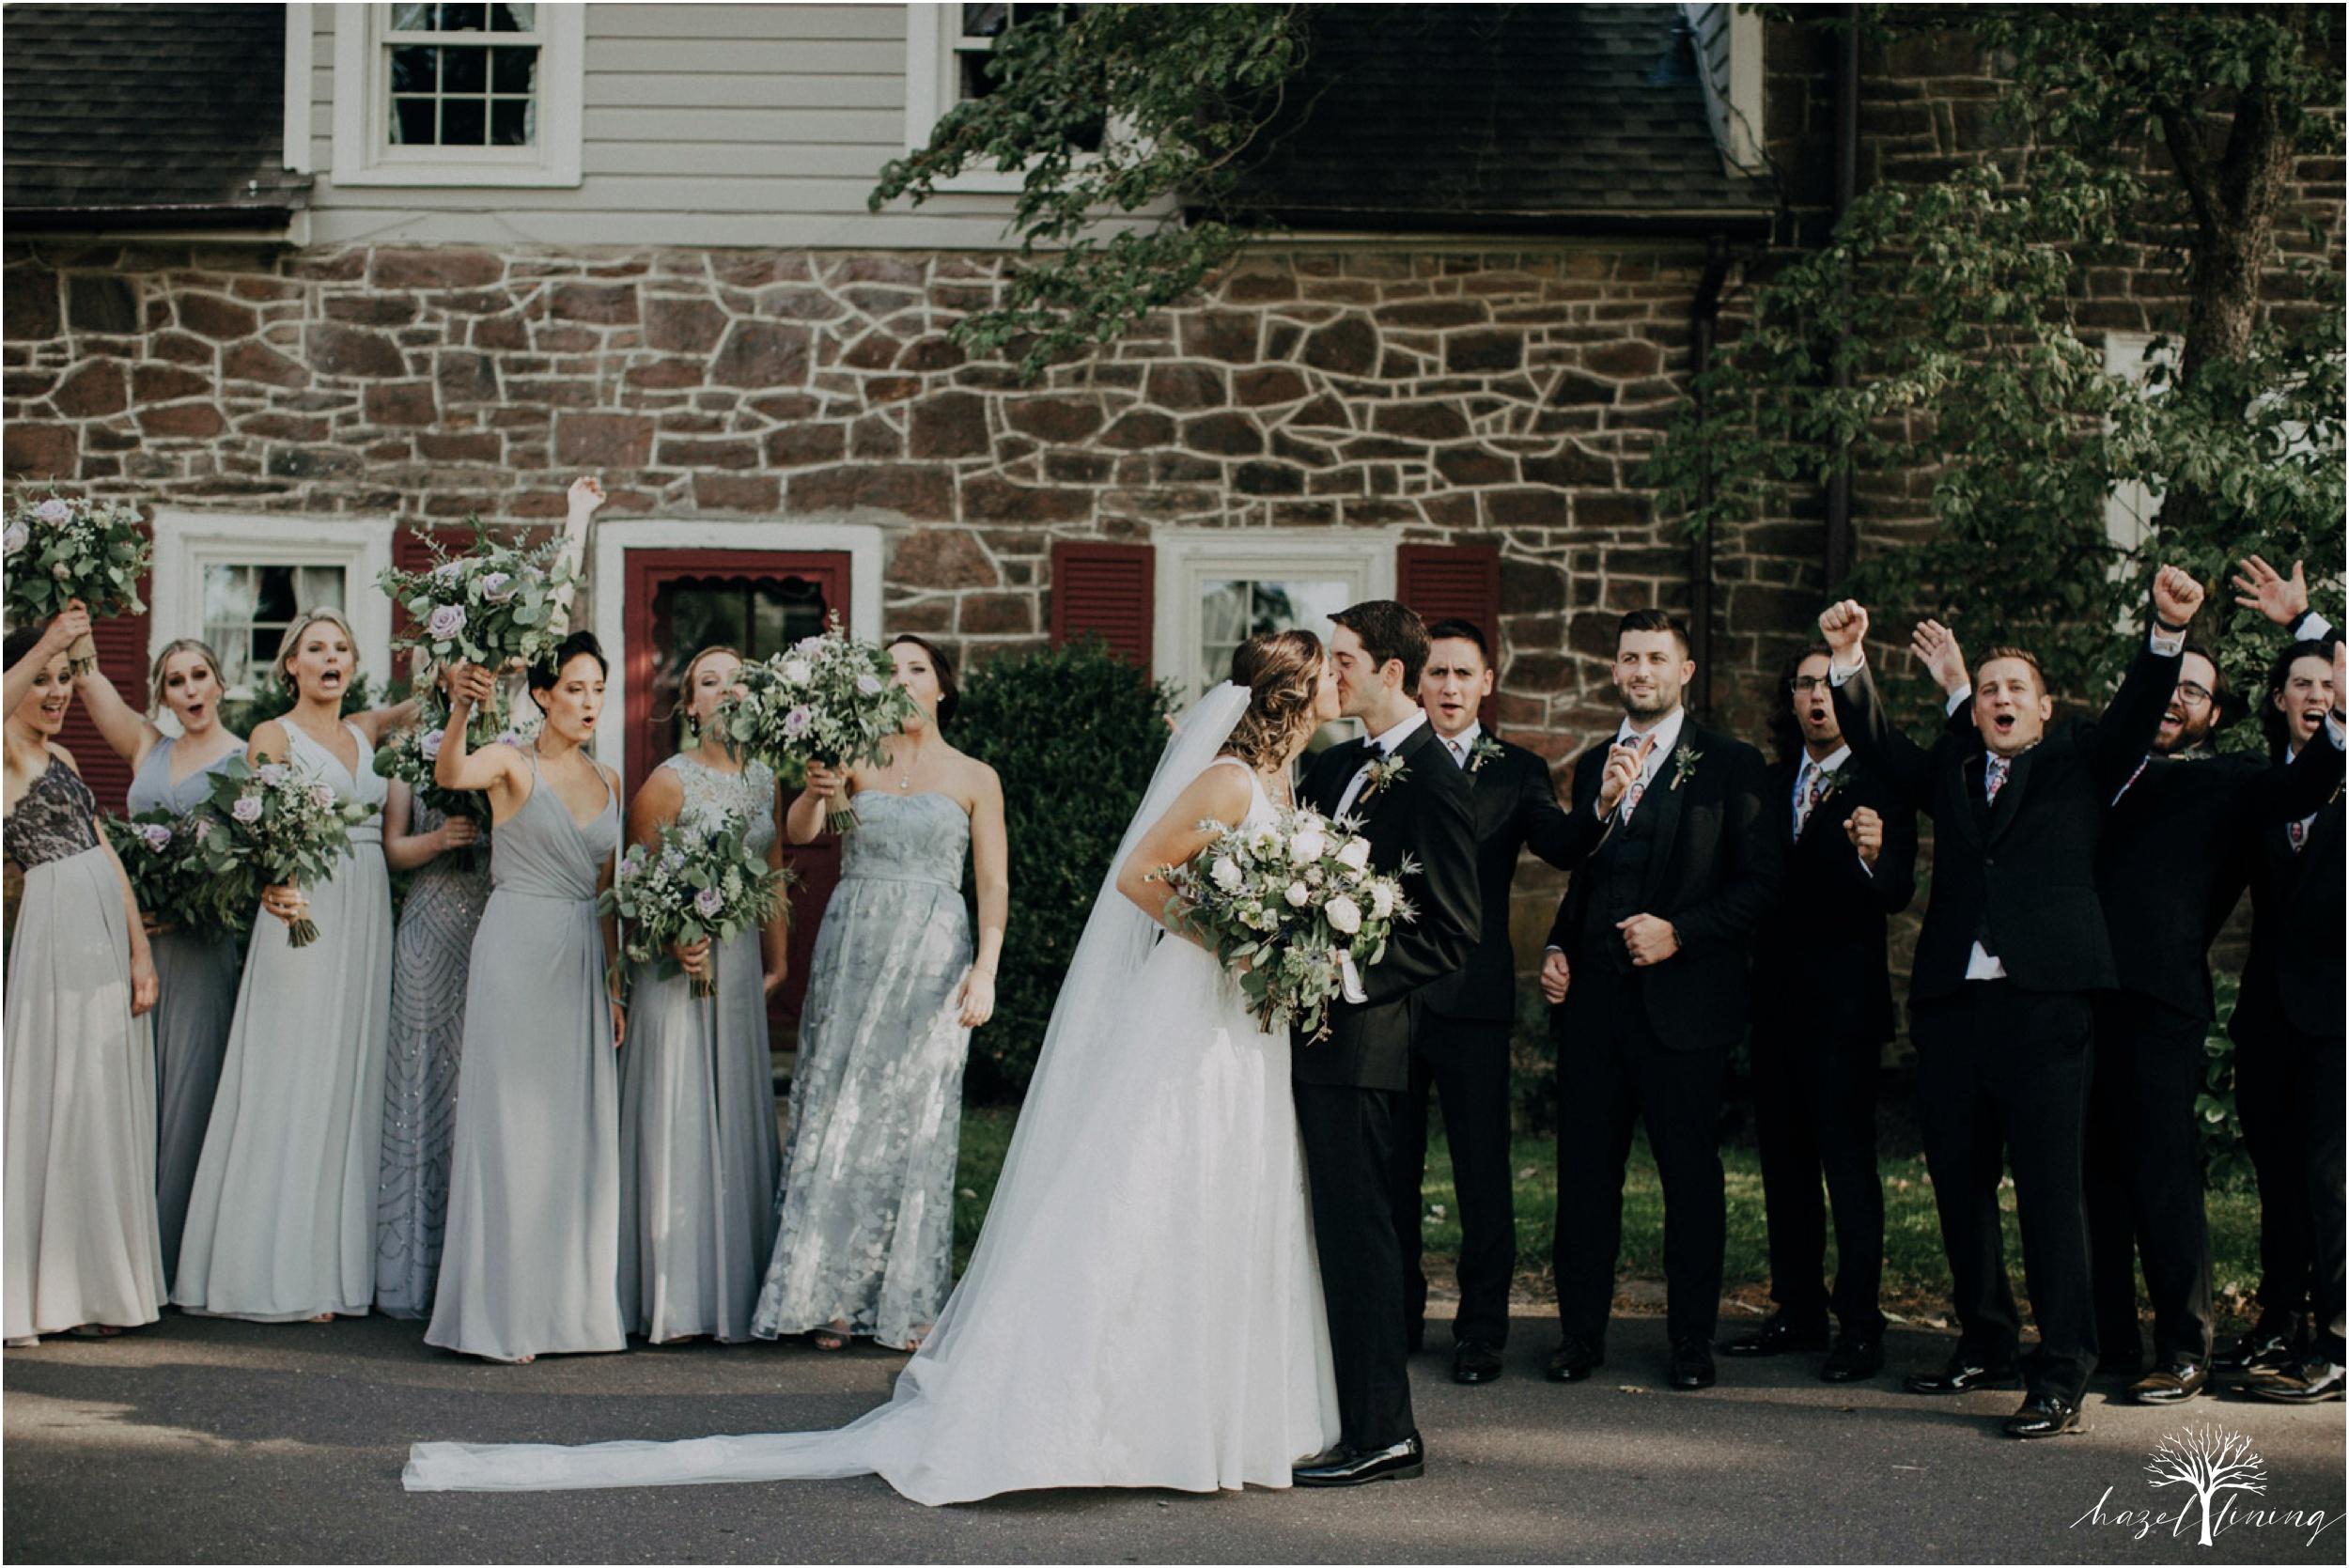 maureen-hepner-anthony-giordano-rose-bank-winery-newtow-pennsylvania-luxury-summer-wedding-hazel-lining-photography-destination-elopement-wedding-engagement-photography_0085.jpg